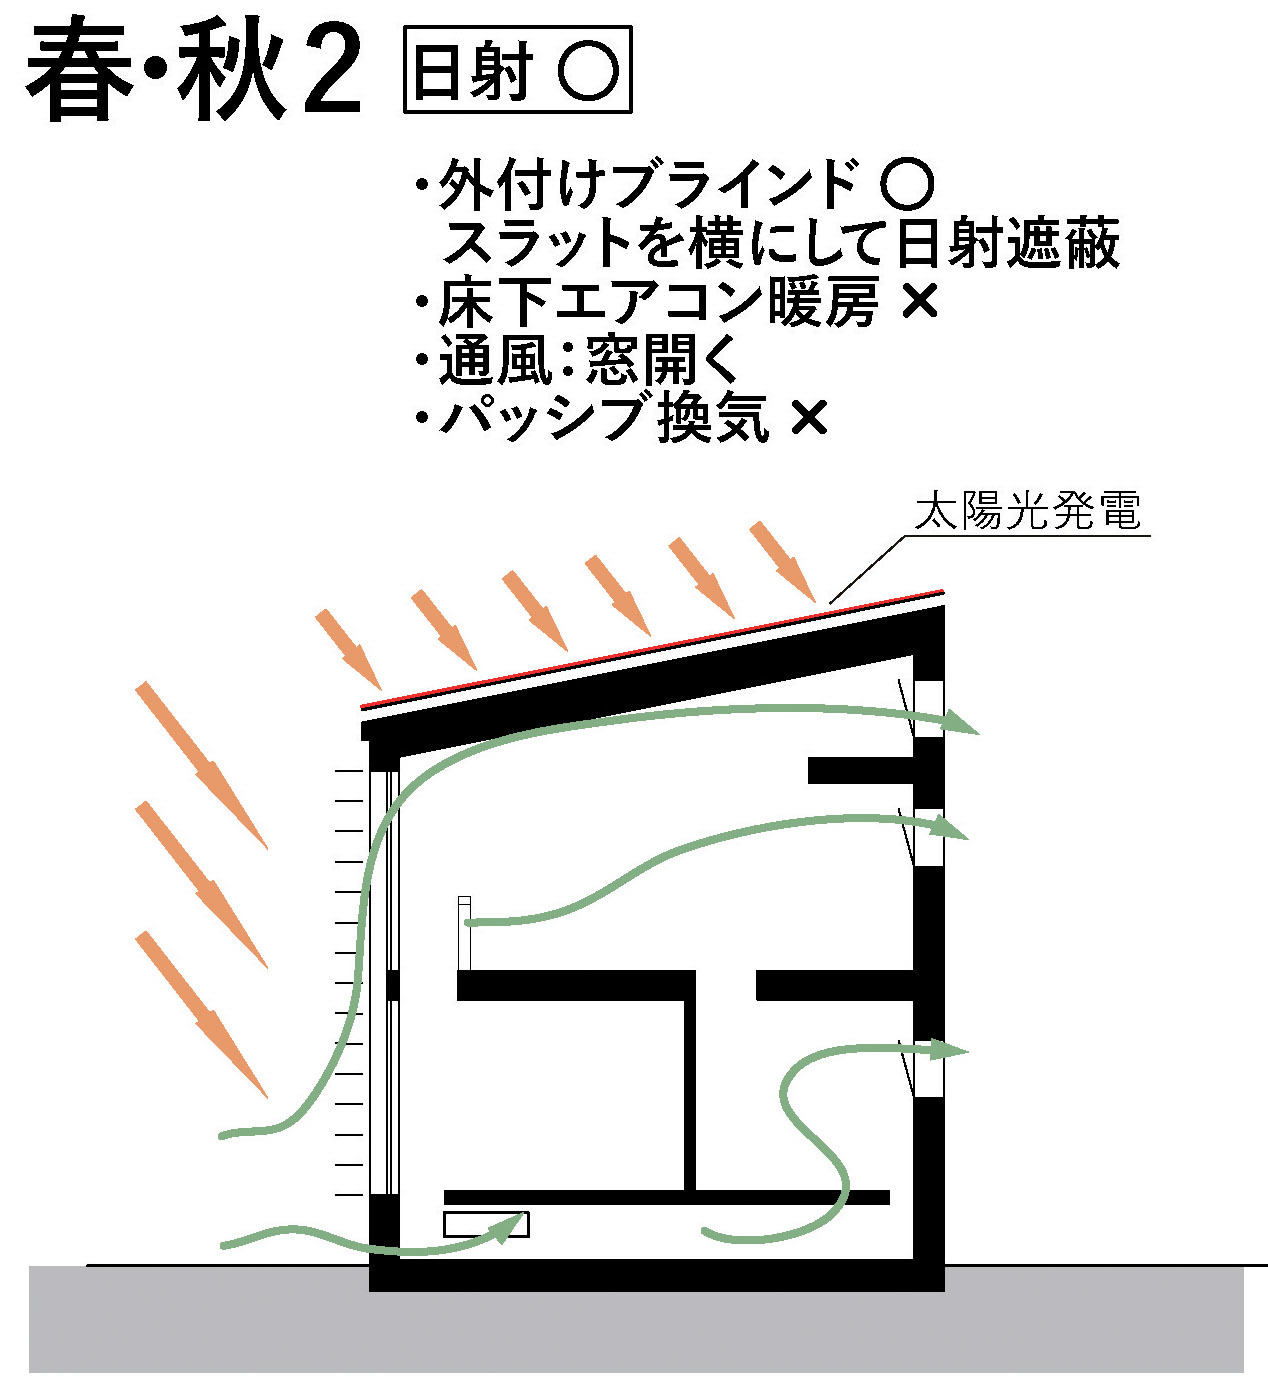 RealZEH・Q1住宅モデル能代:暖冷房換気モード春秋_e0054299_13064896.jpg